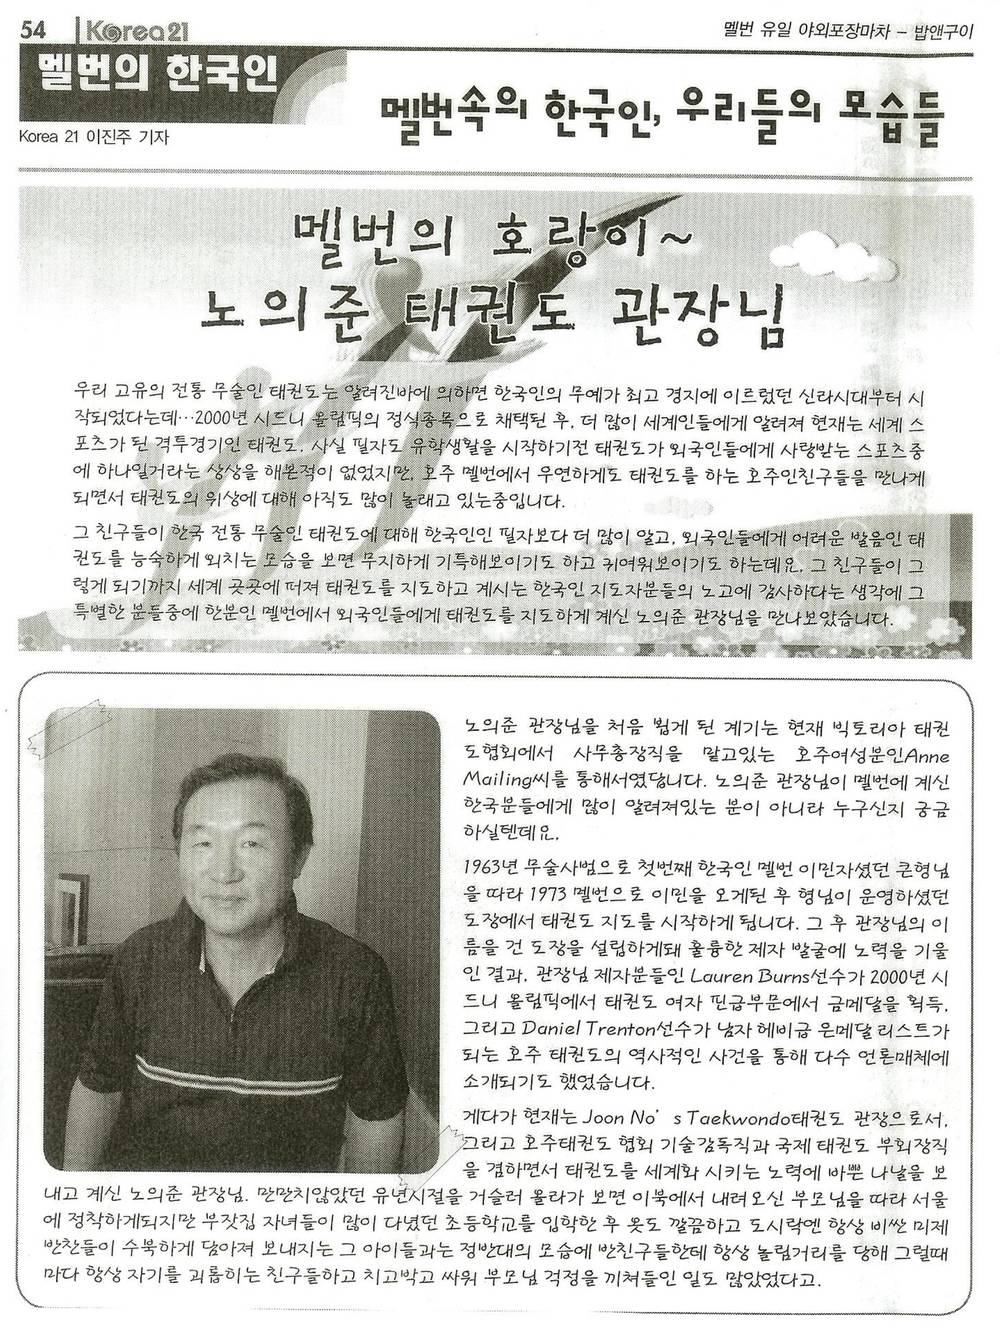 korea21.jpg